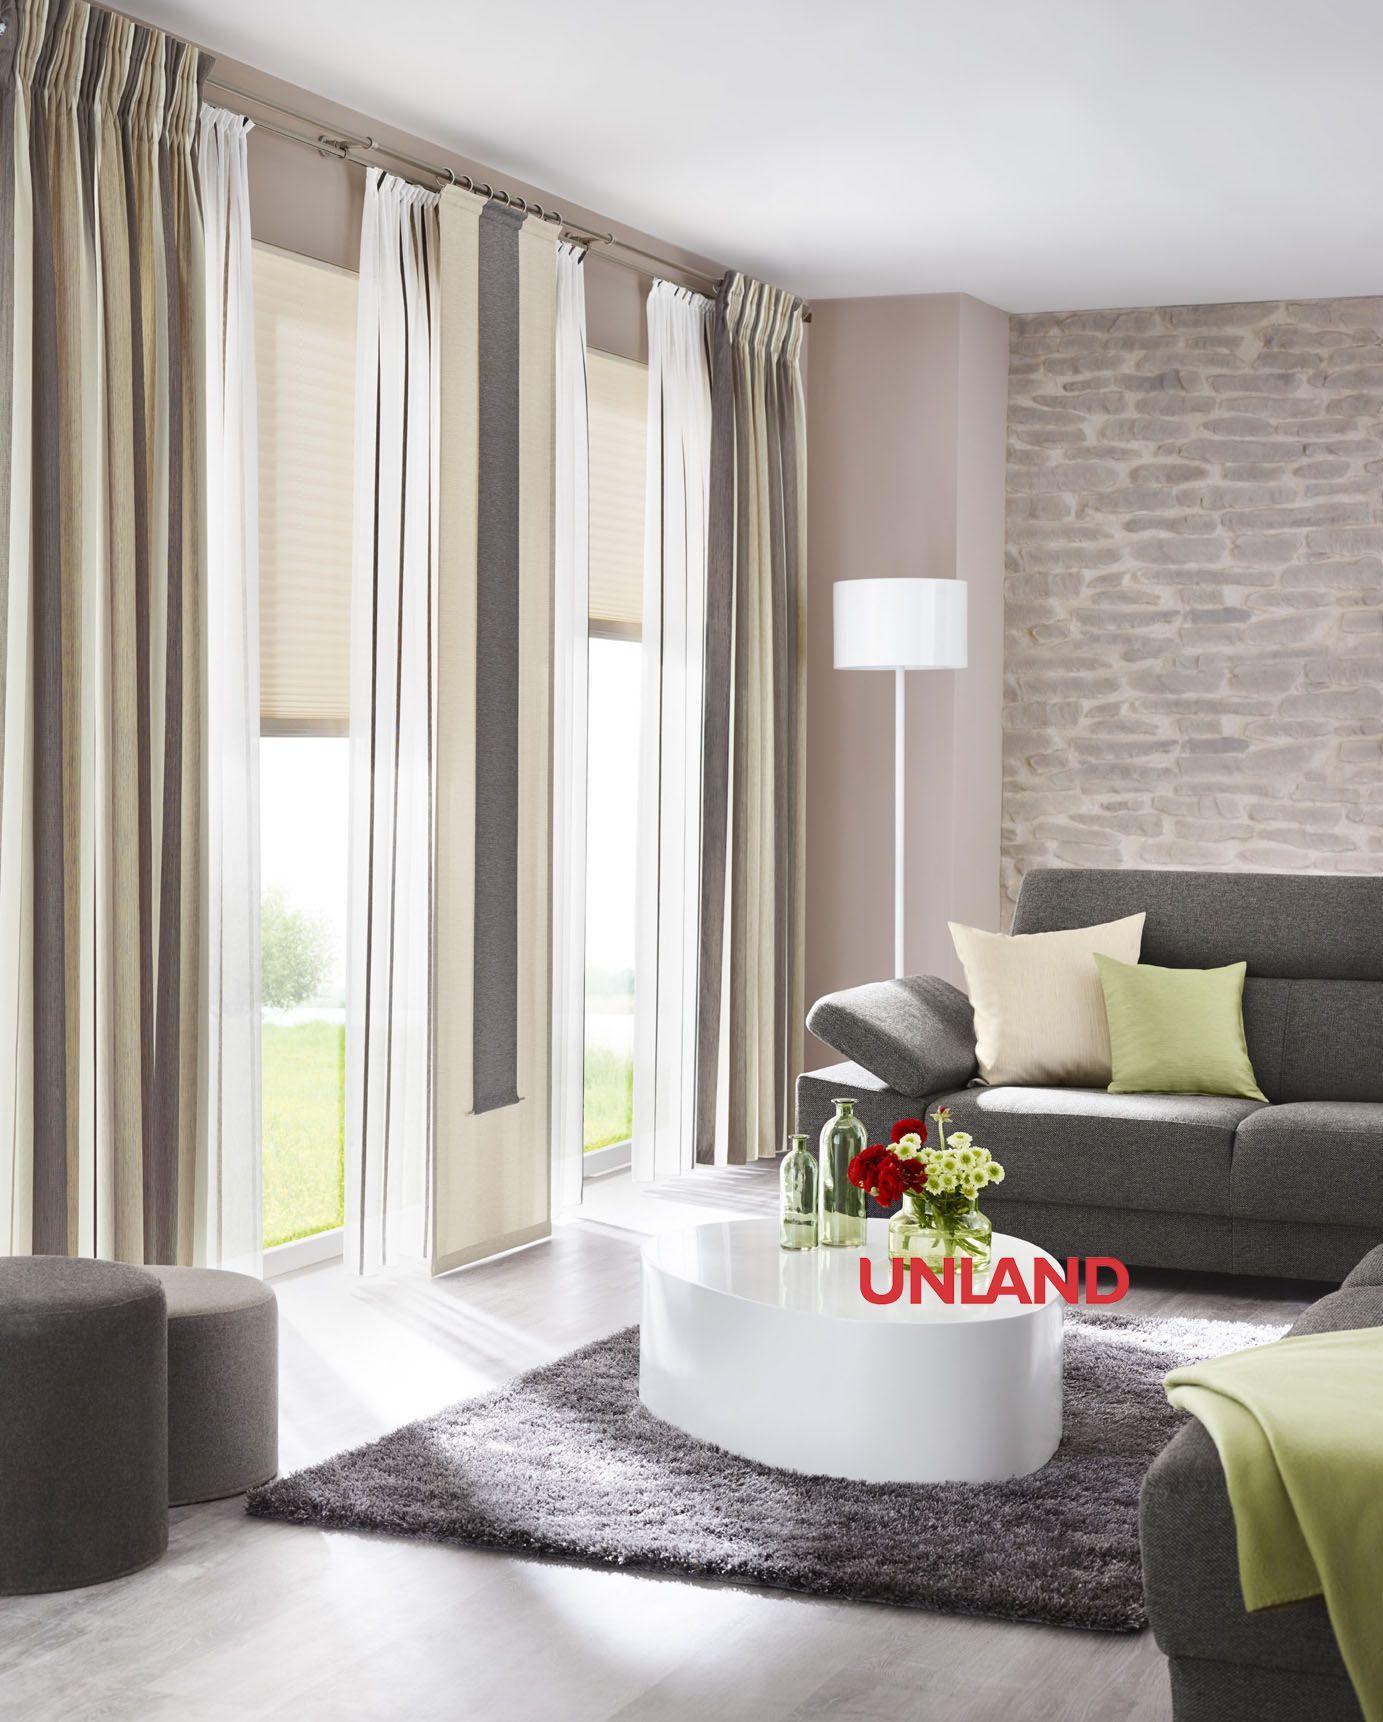 Unland Livingreet Fensterideen Gardinen Und Sonnenschutz